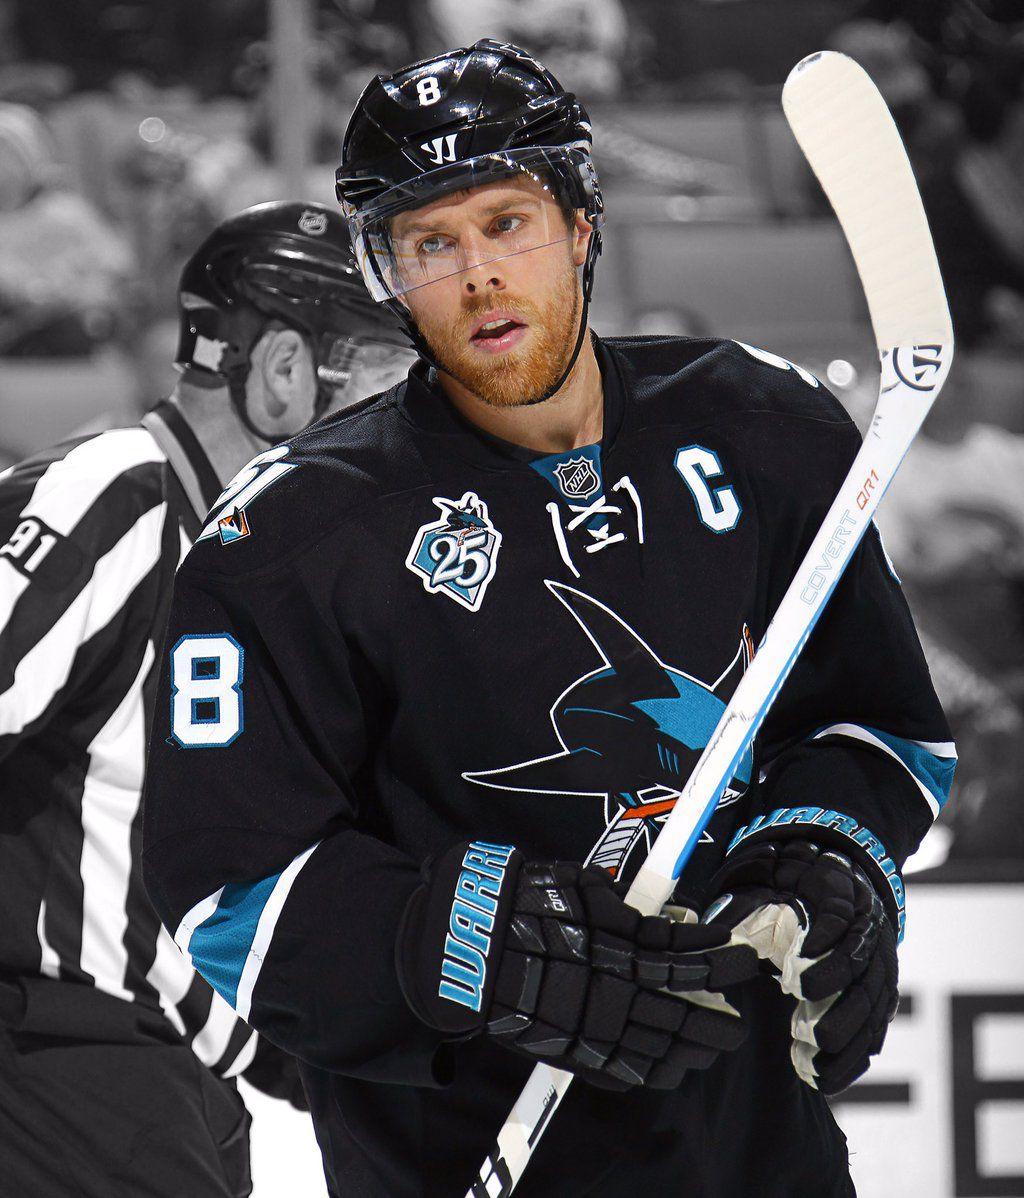 d43b6b9231e Joe Pavelski Nhl Hockey Jerseys